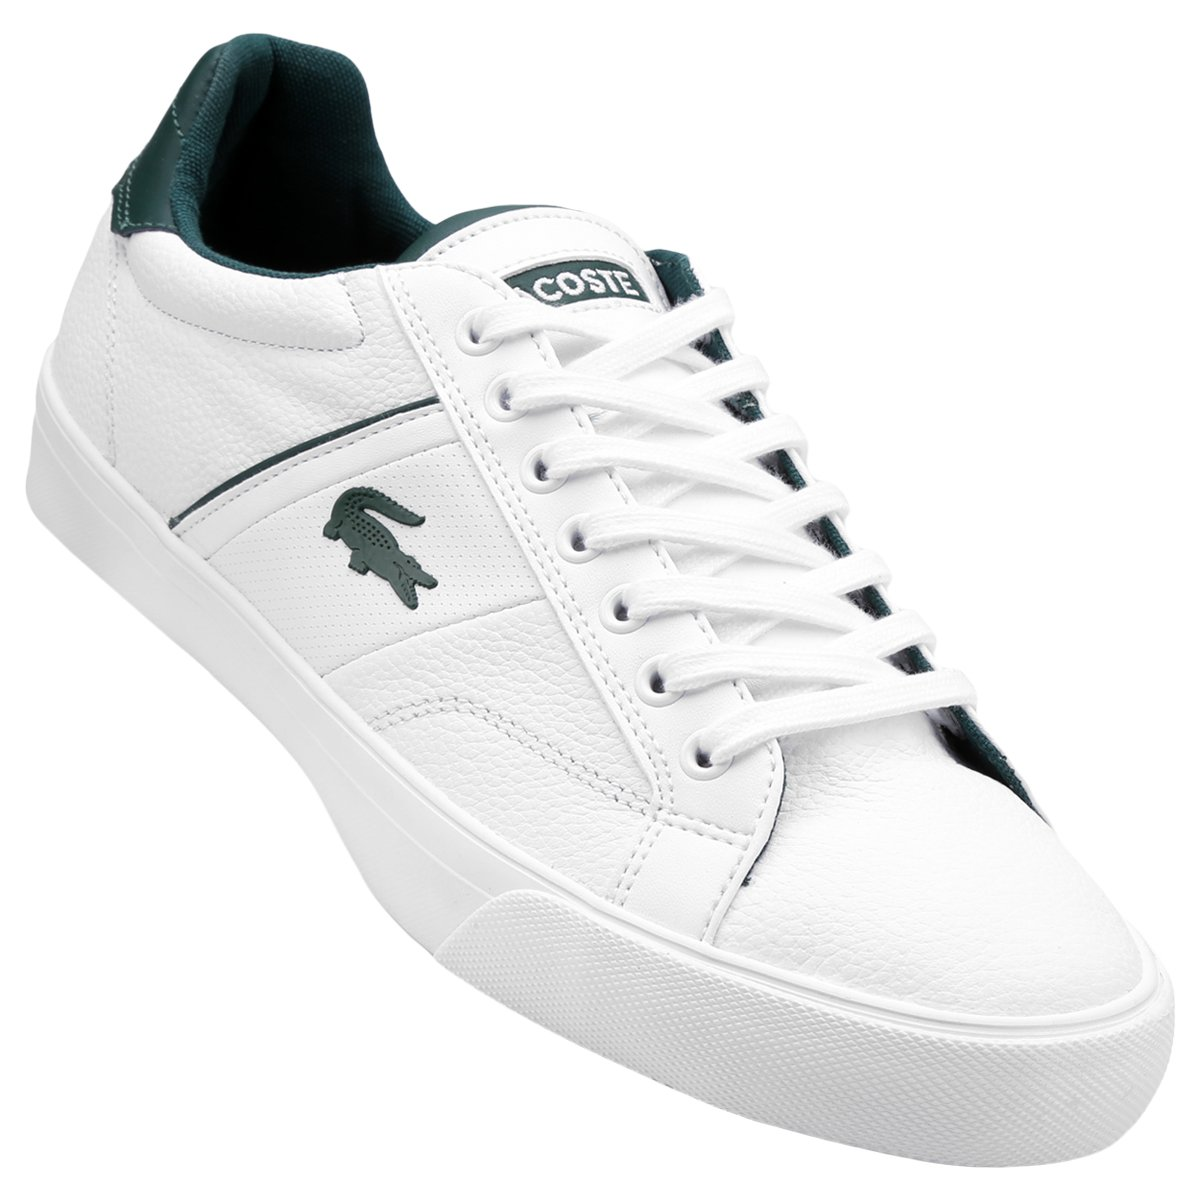 Rei Tennis Shoes